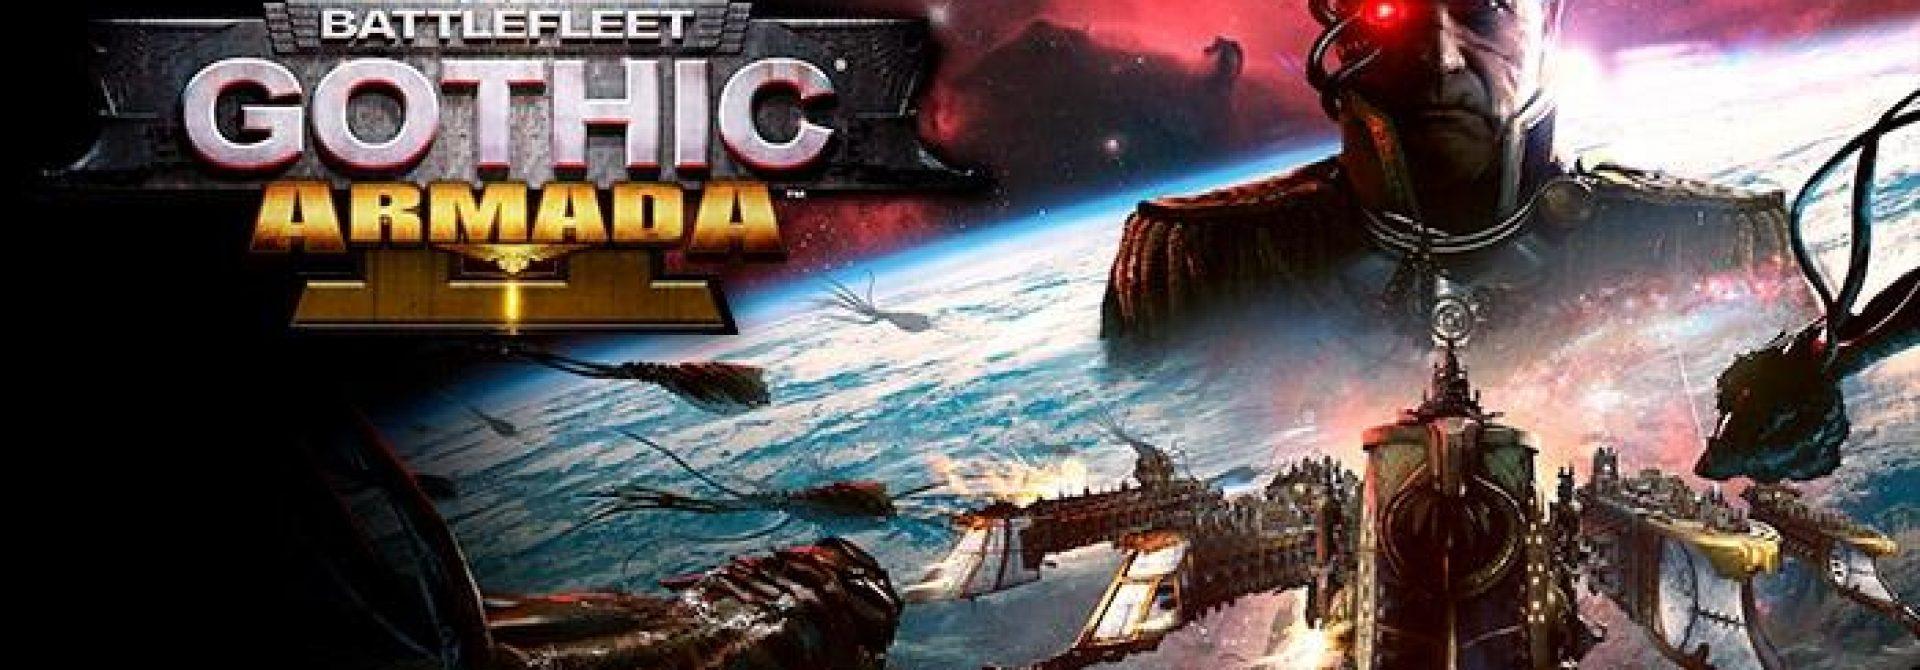 Massive Fleets Update Comes To Battlefleet Gothic: Armada 2